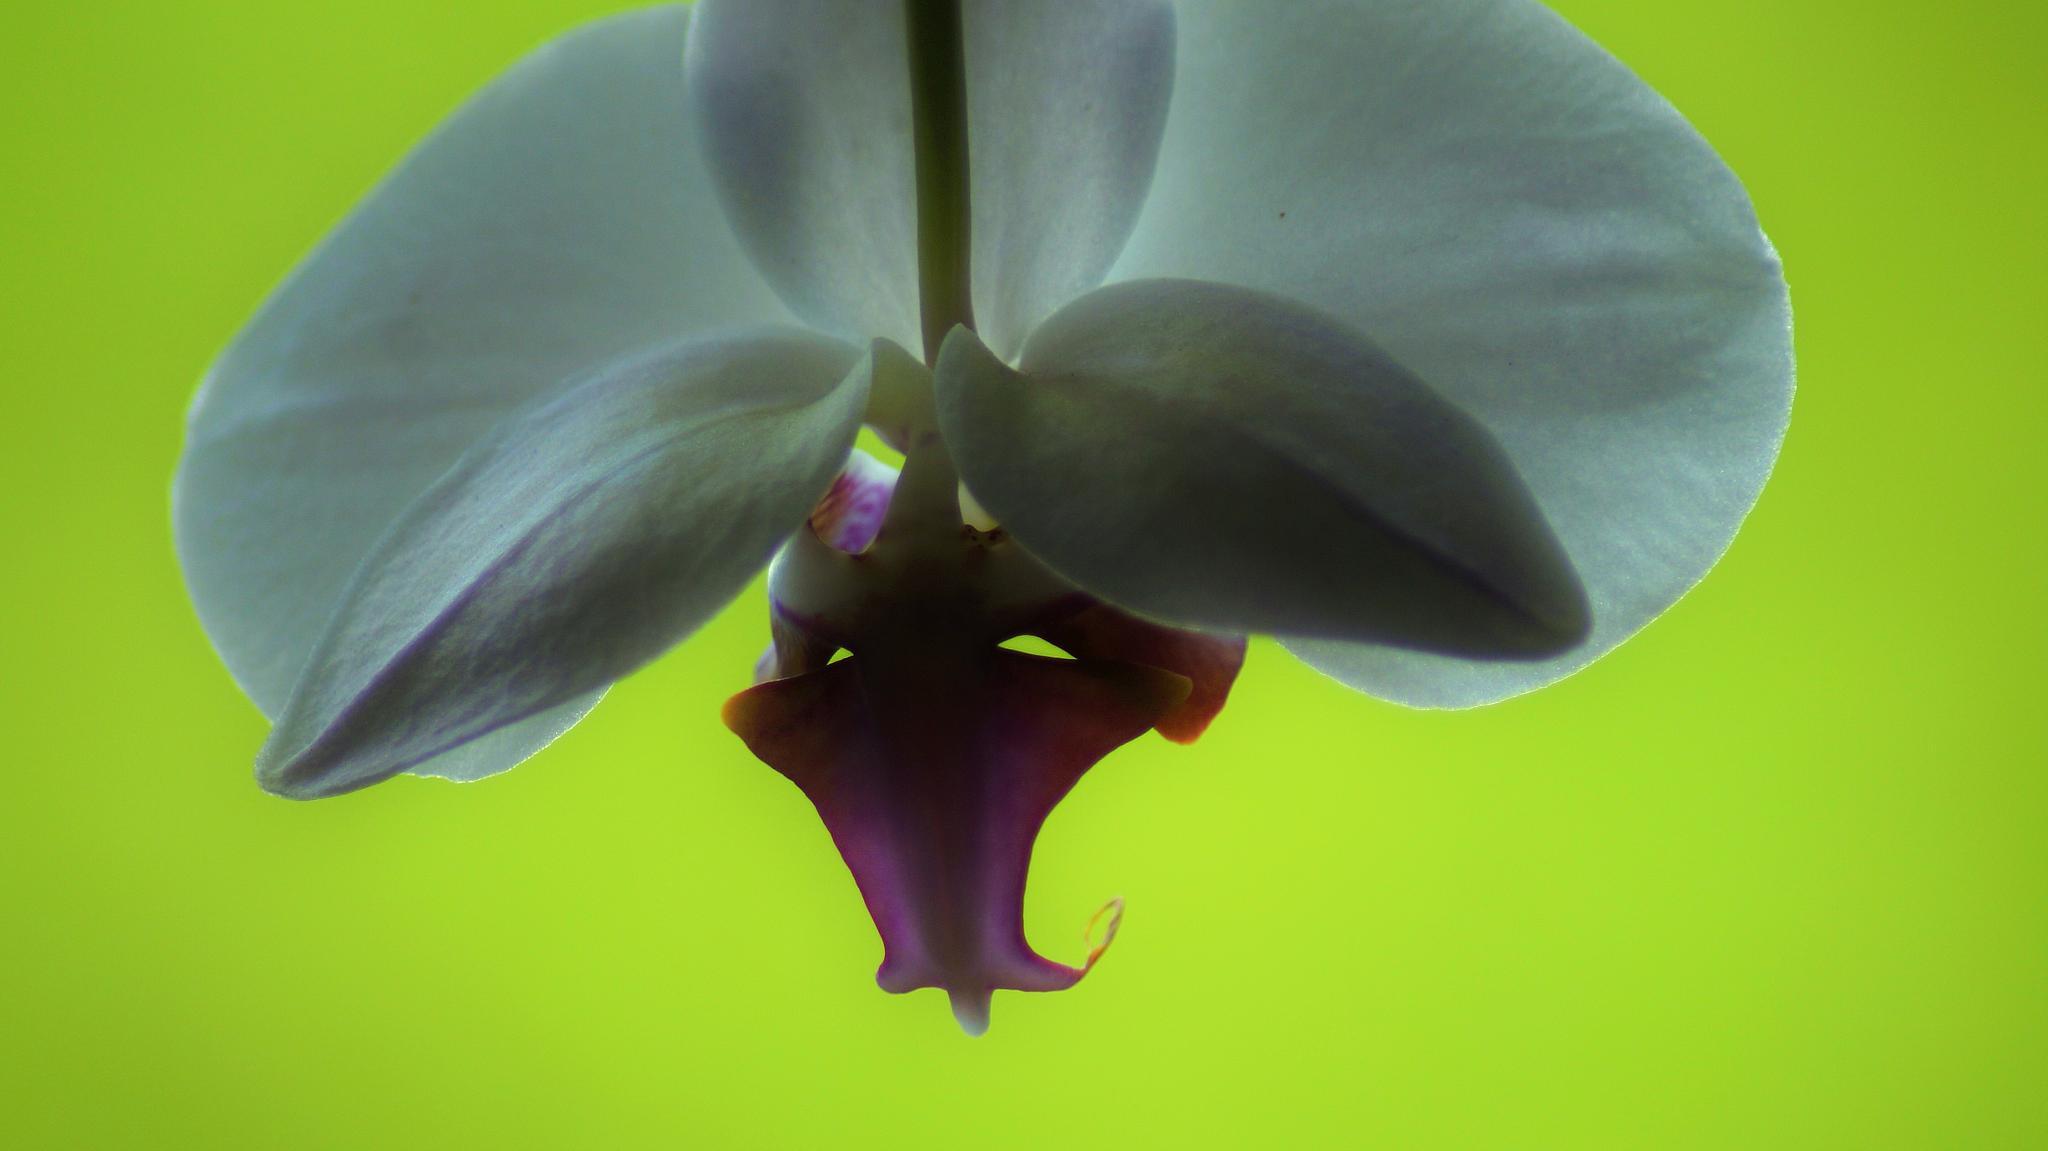 Orchide by lisbeth.westergaard